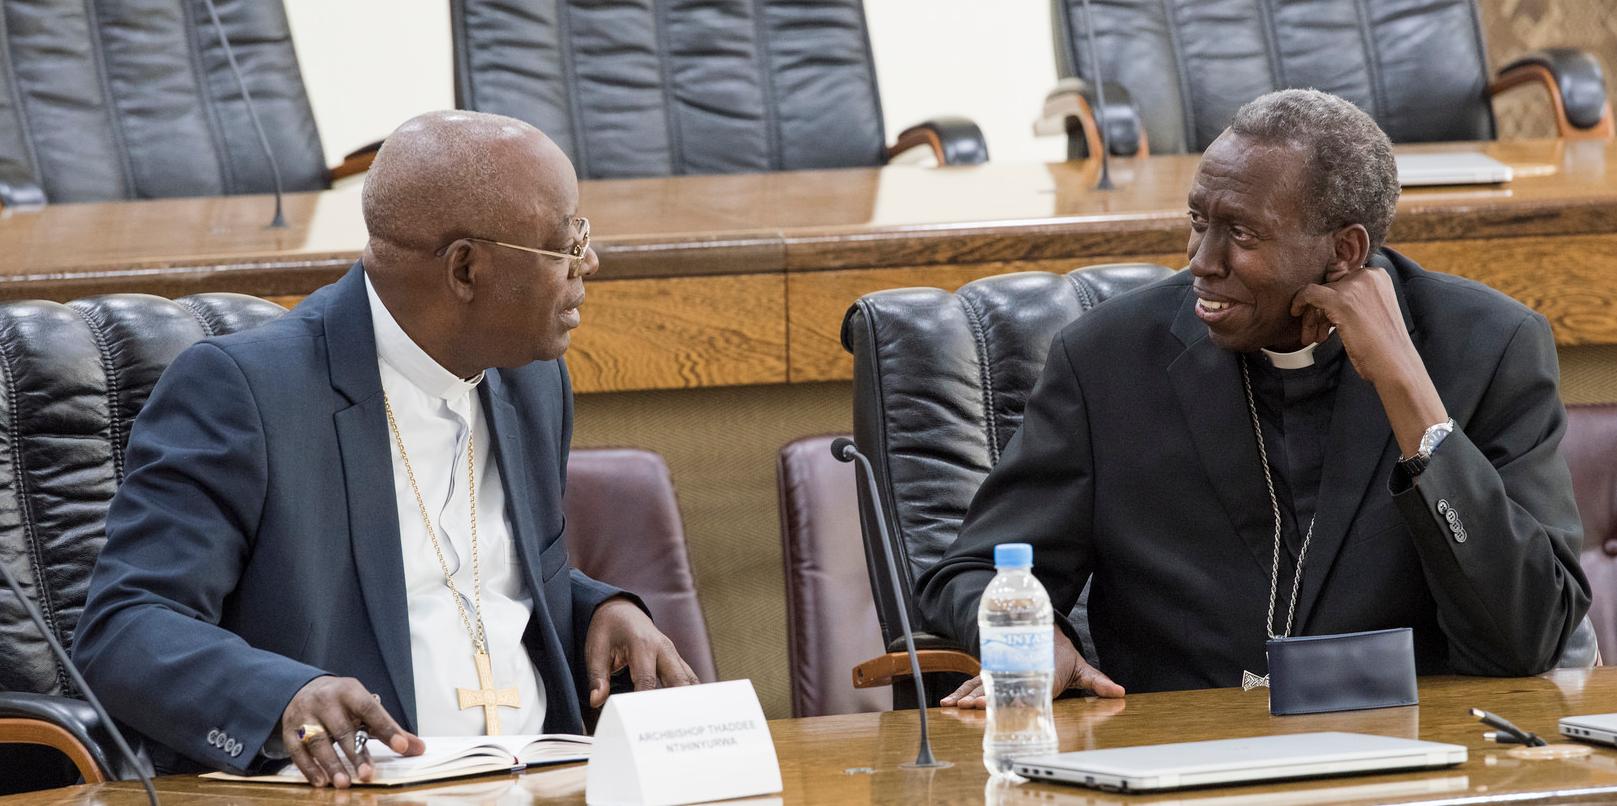 Bishop of Kabgayi Diocese Smaragde Mbonyintege (r) chats with Archbishop of Kigali Thadee Ntihinyurwa